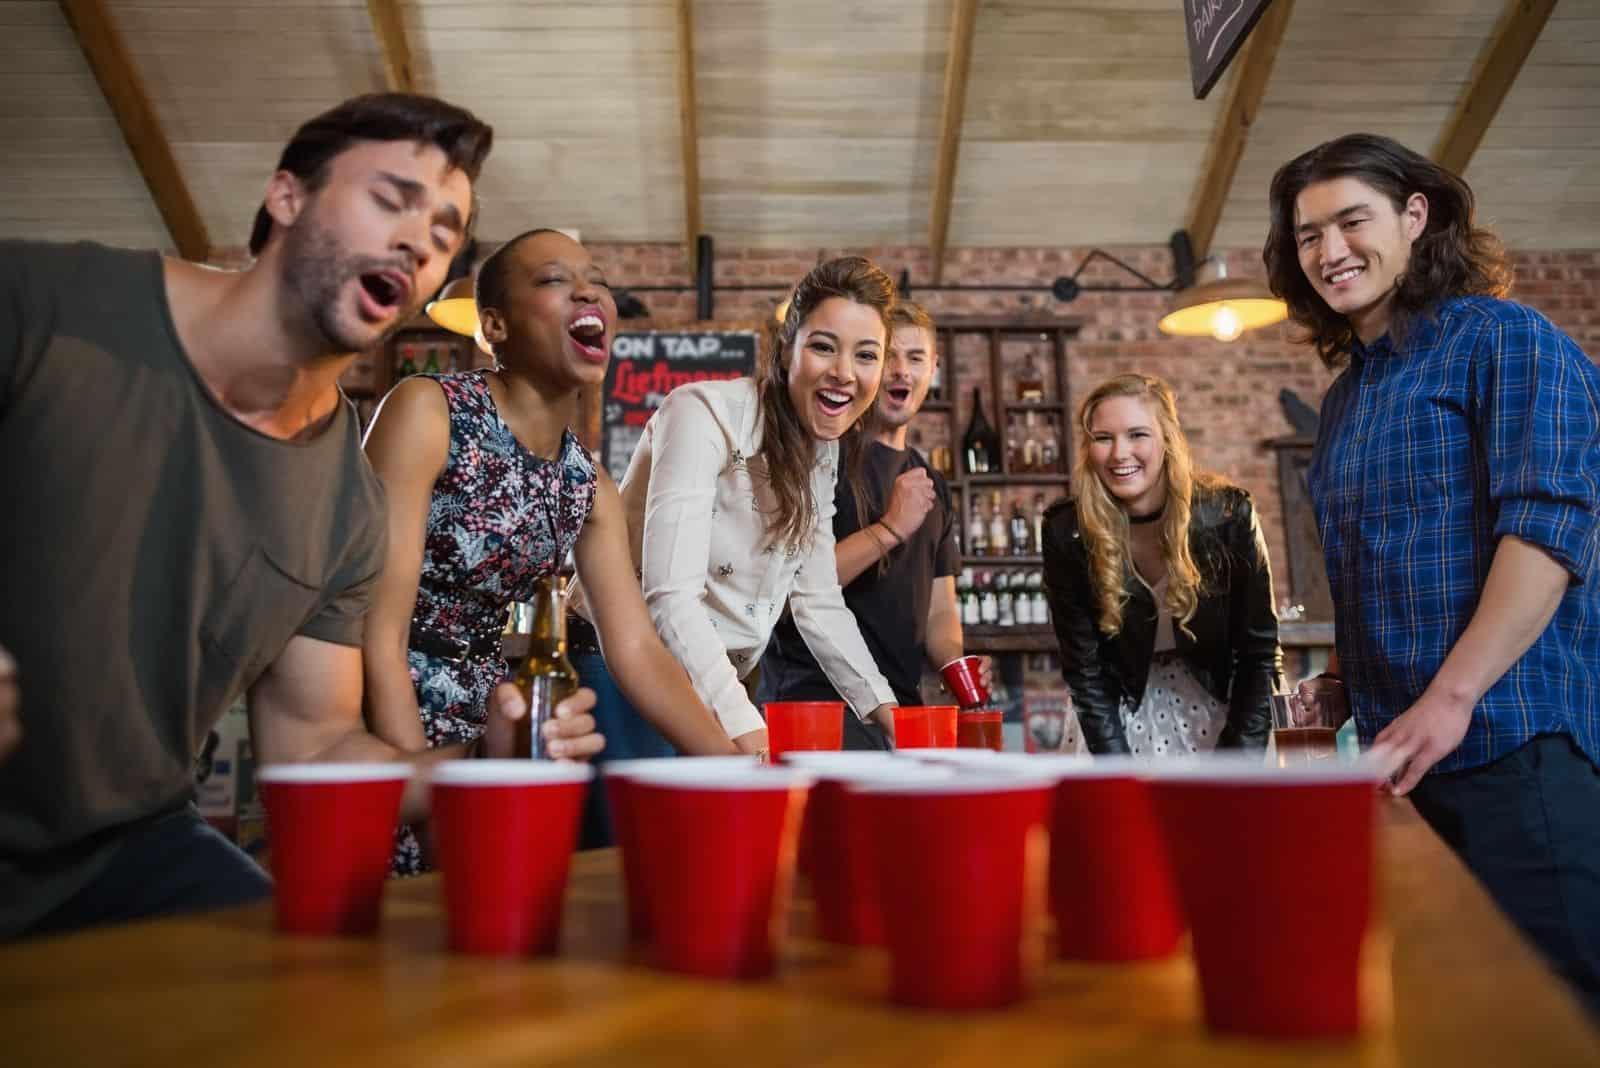 Junge Freunde spielen drinnen Bierpong